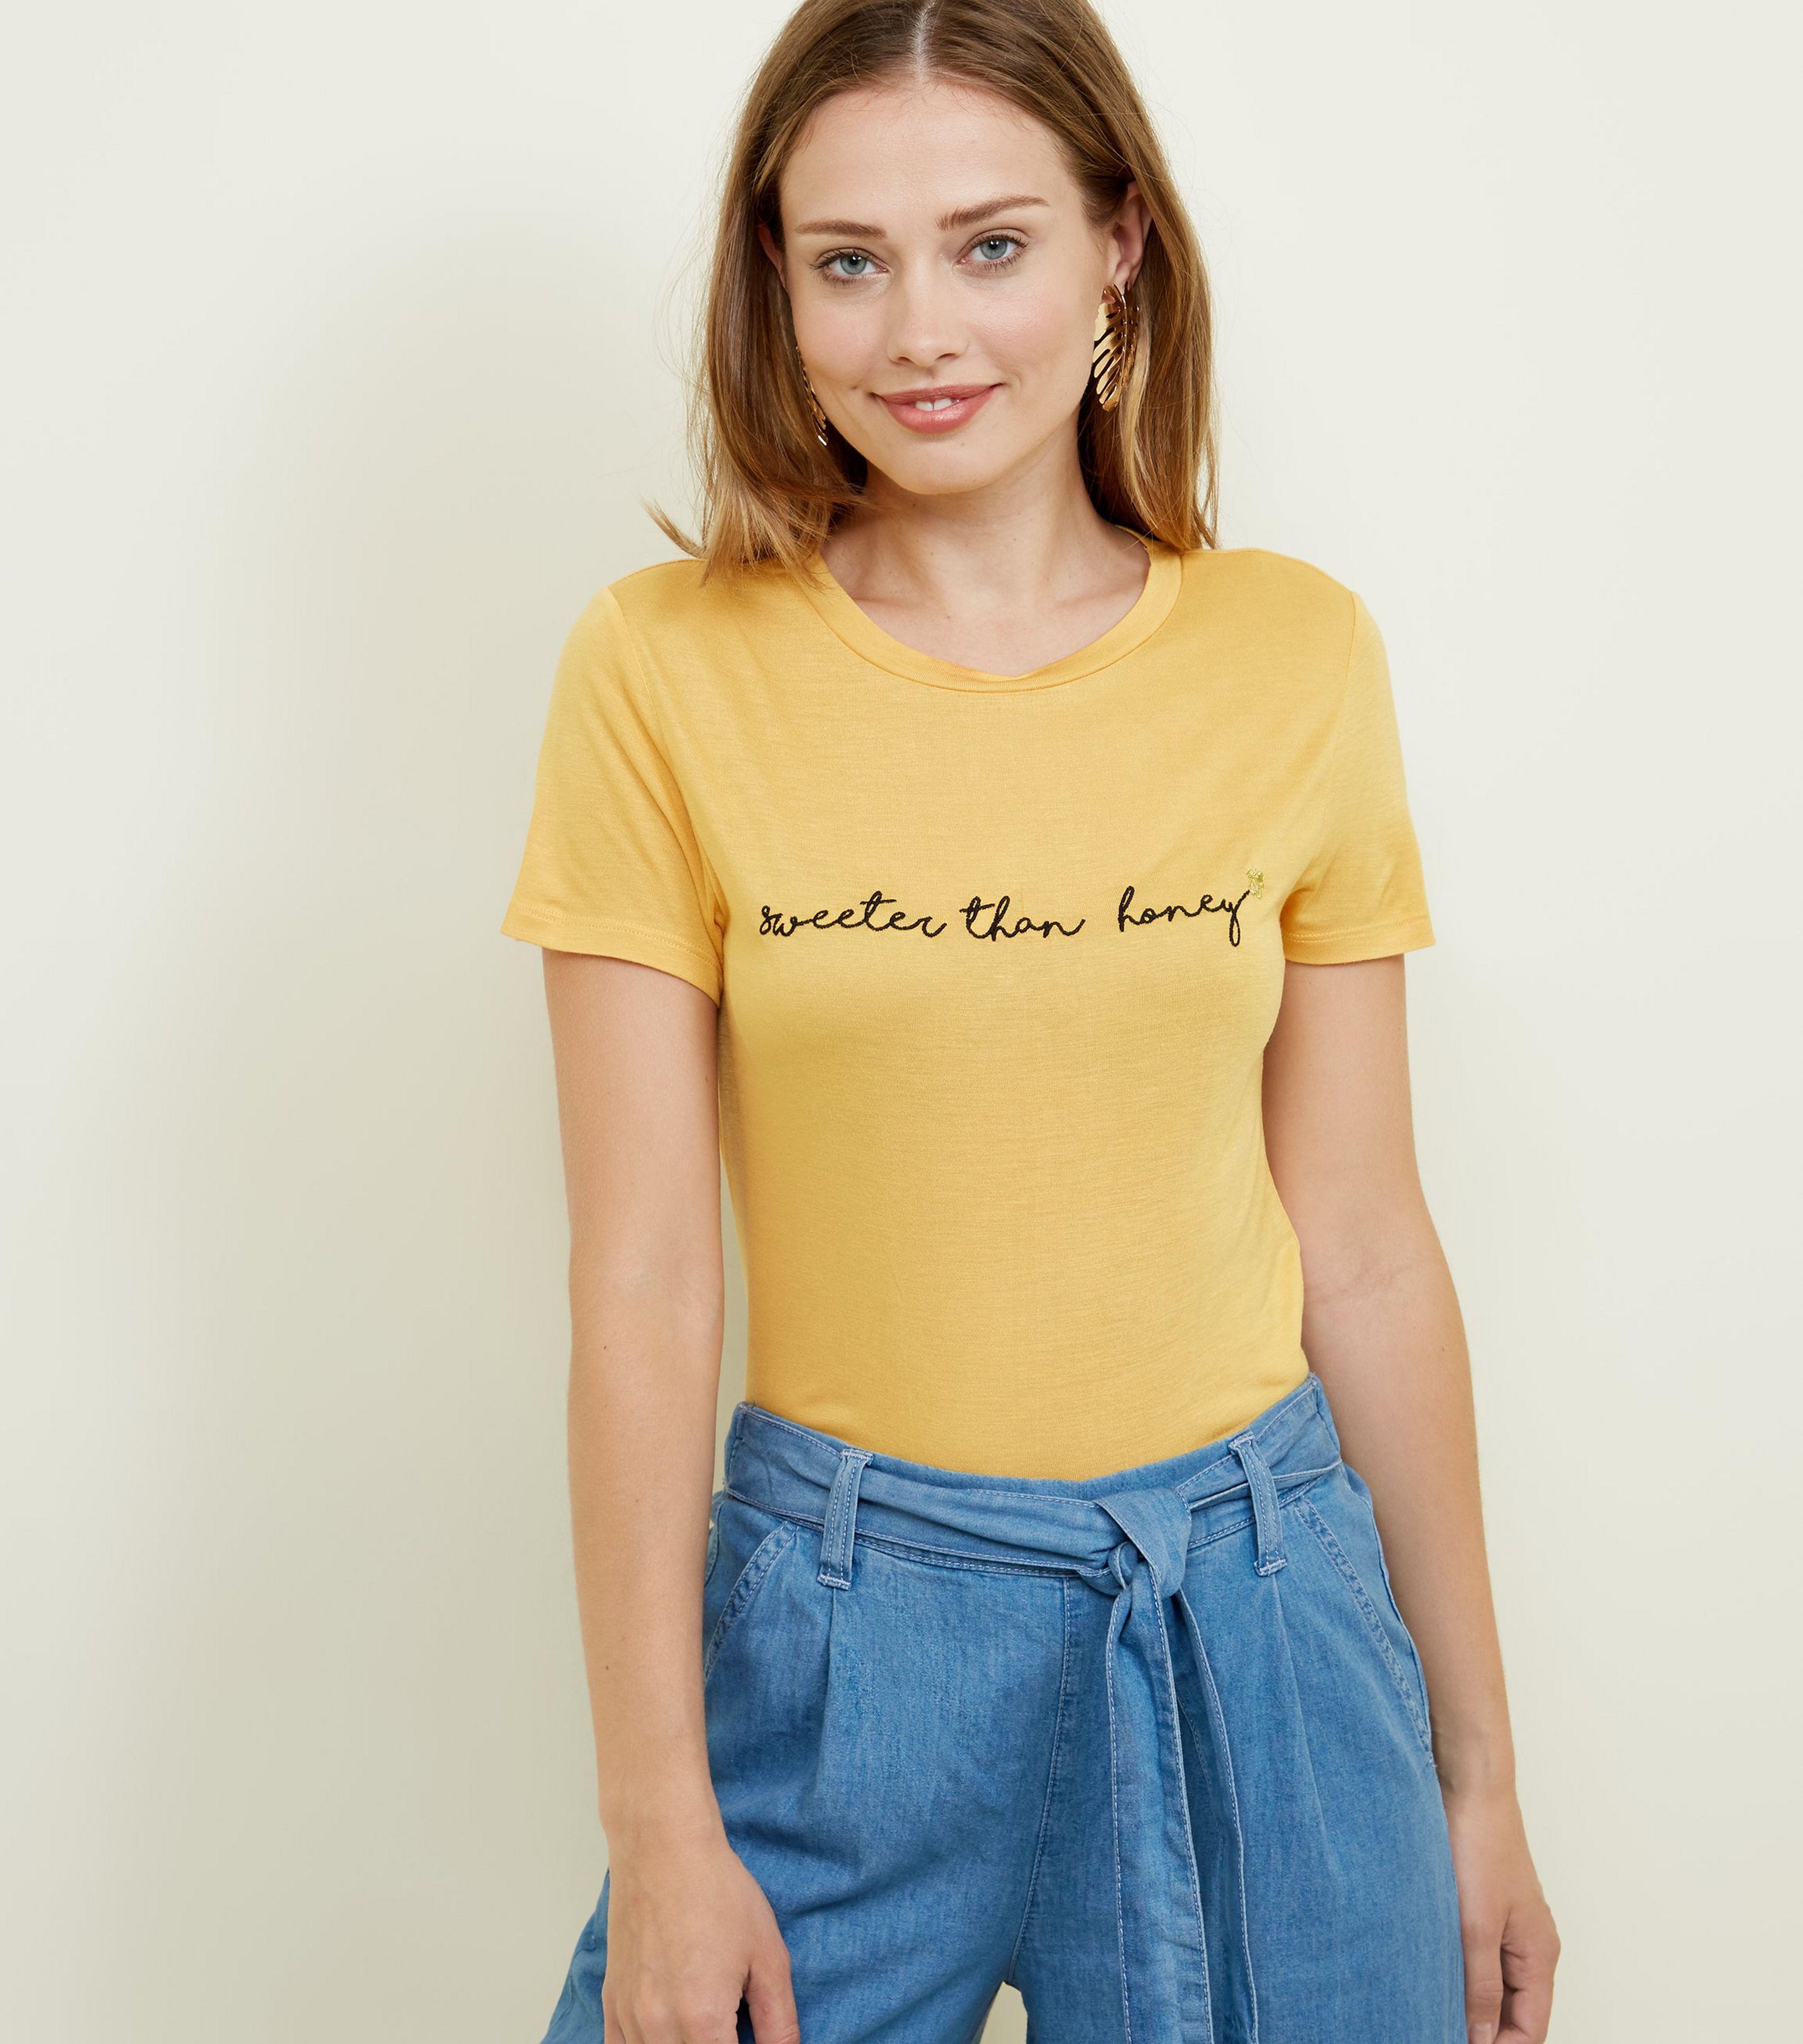 7b889b753b8 New Look Mustard Sweeter Than Honey Slogan T-shirt in Yellow - Lyst